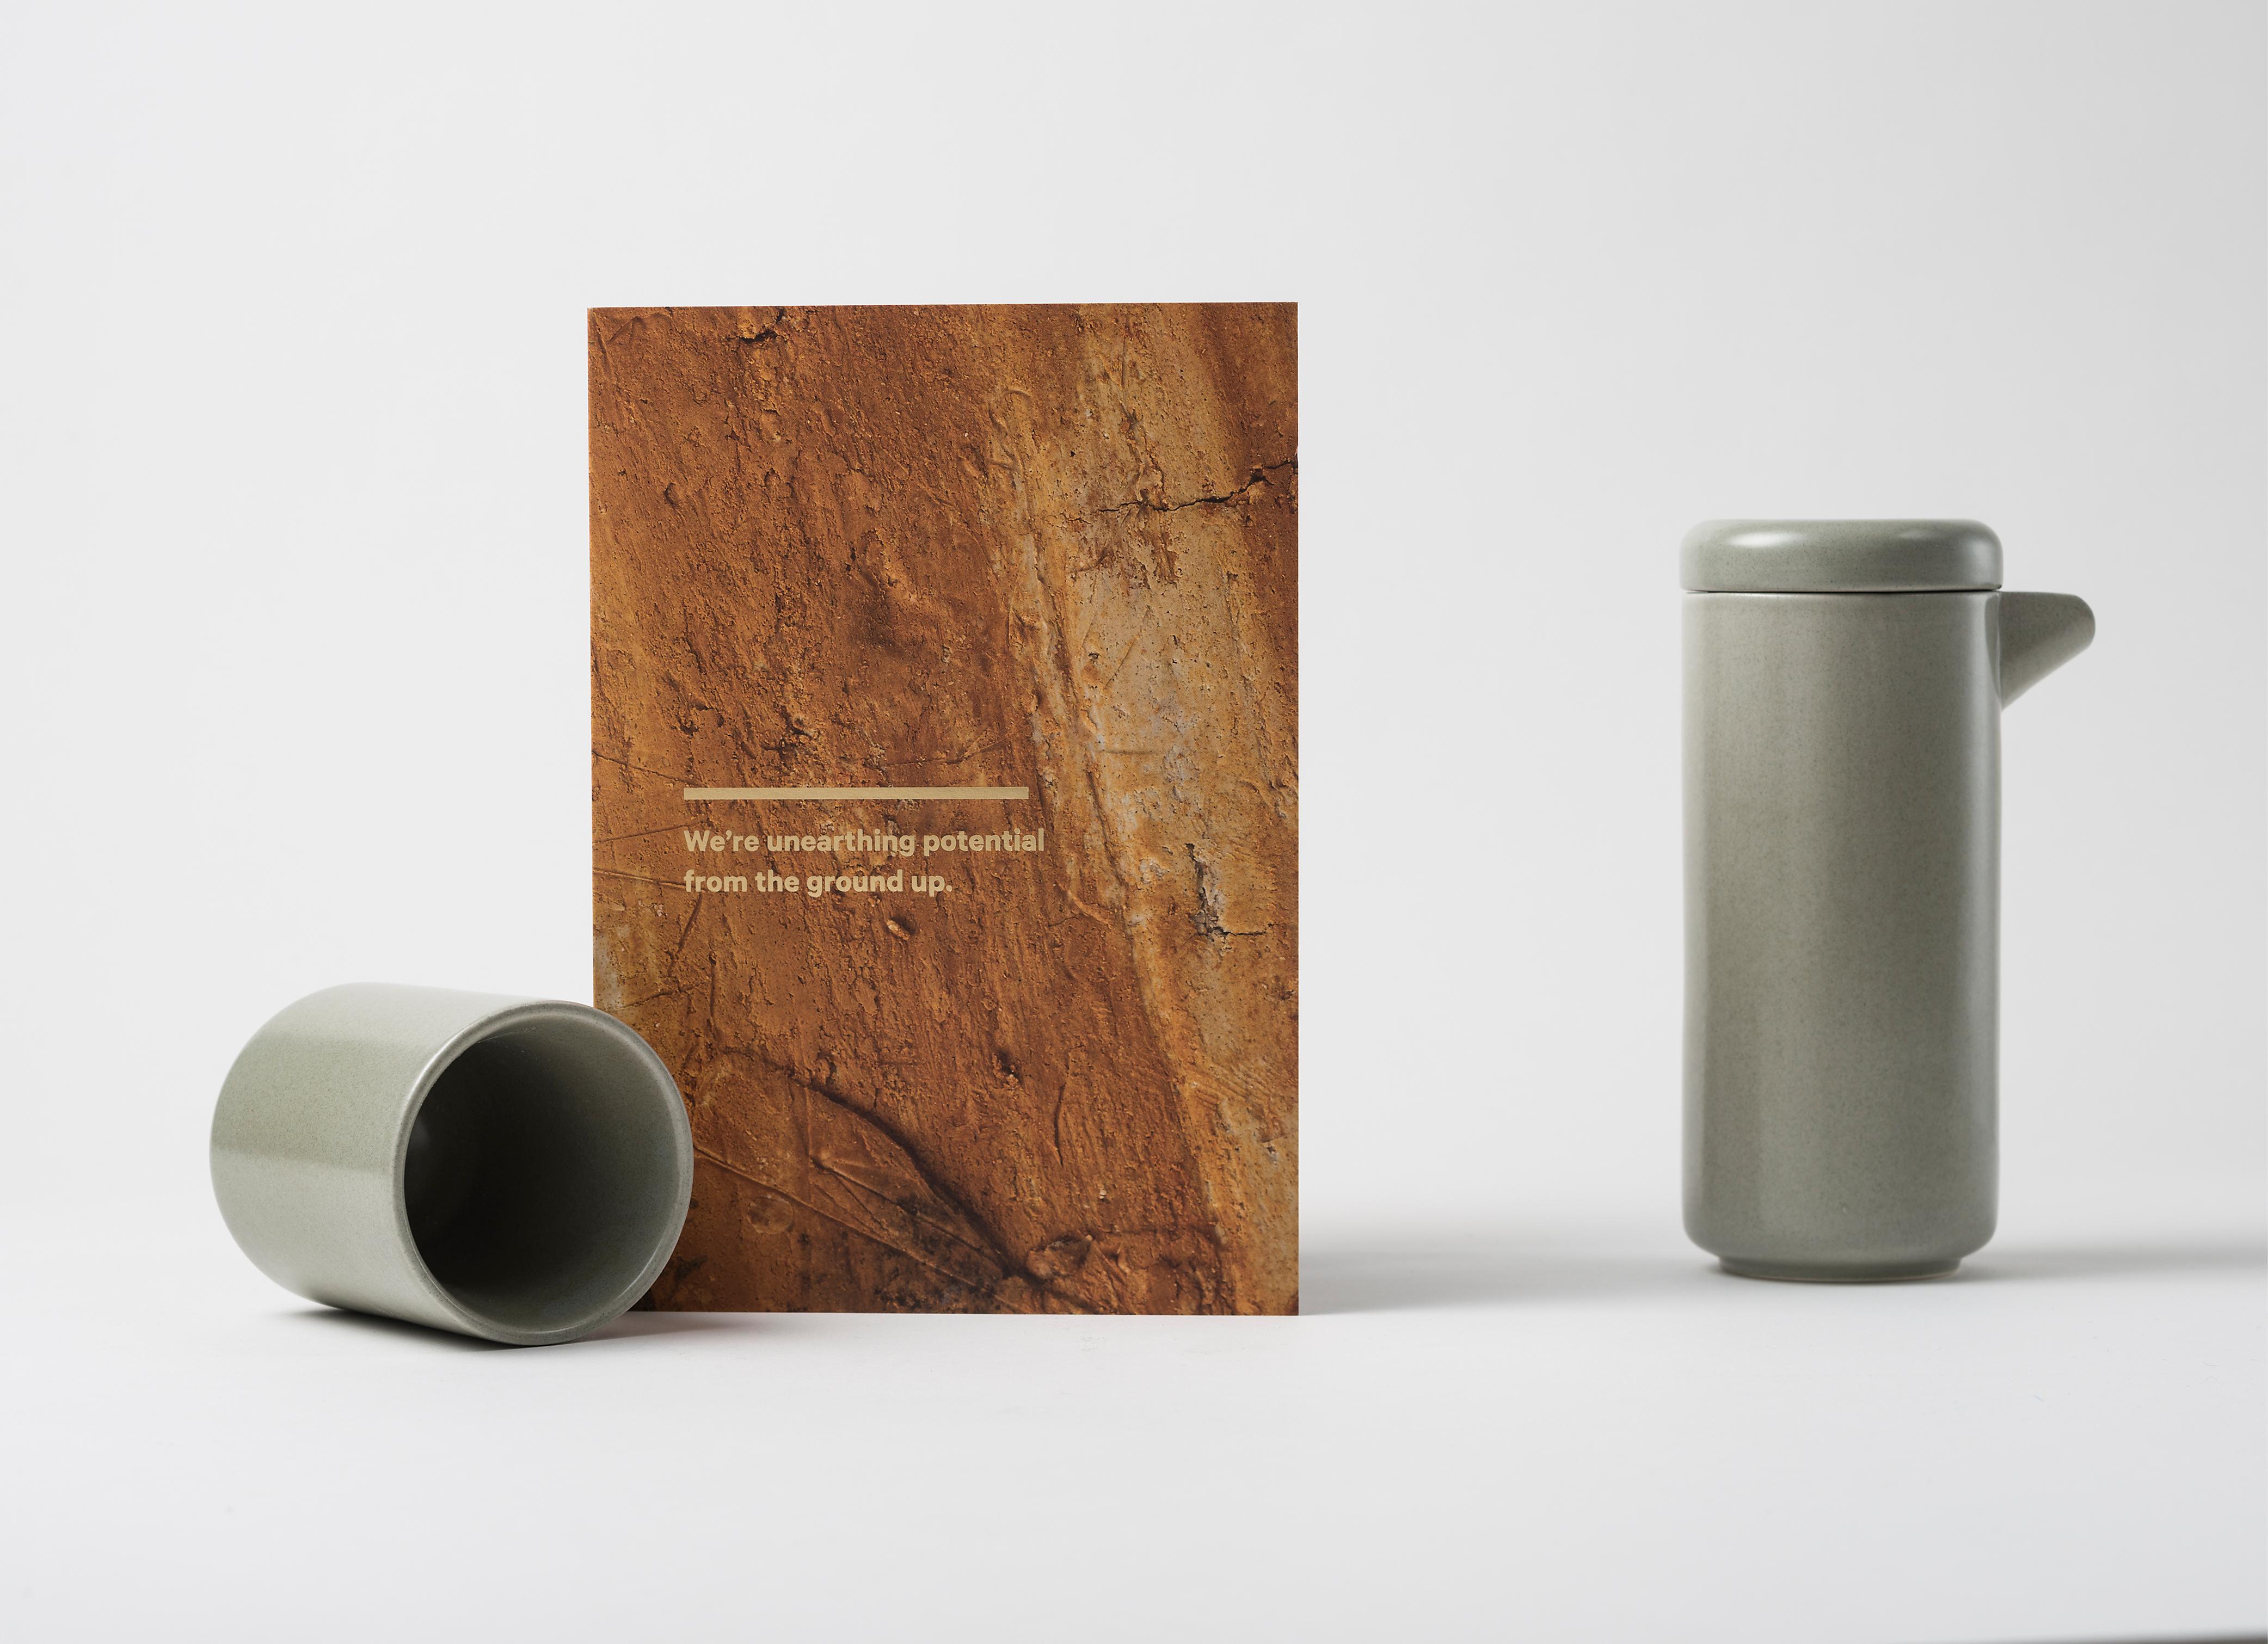 https://tanamitchell.com/wp-content/uploads/2018/06/NZICC-Tea-2000-x-1450-px4.jpg